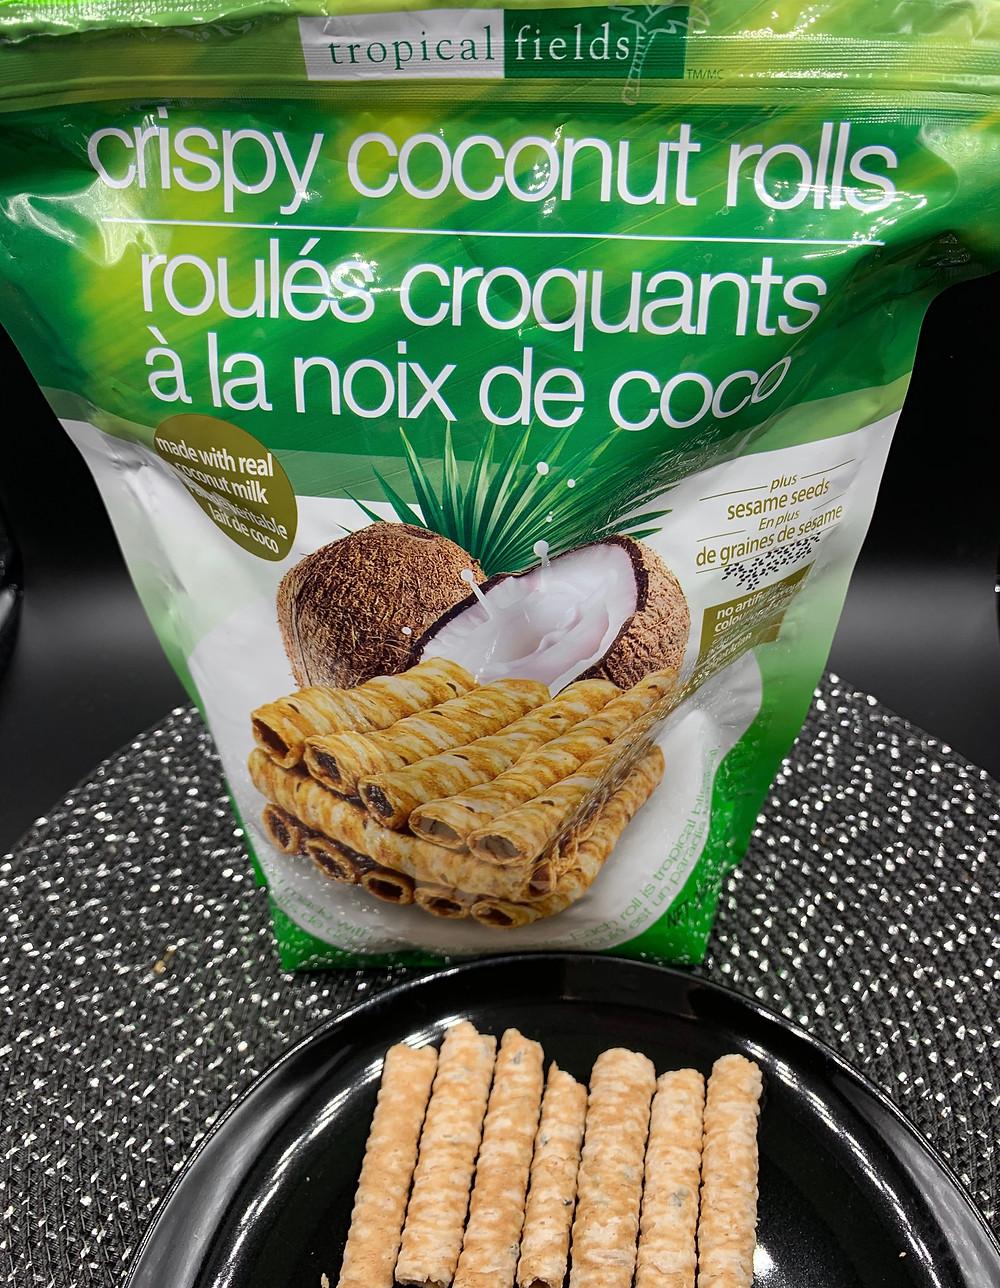 Costco Tropical Fields Crispy Coconut Rolls